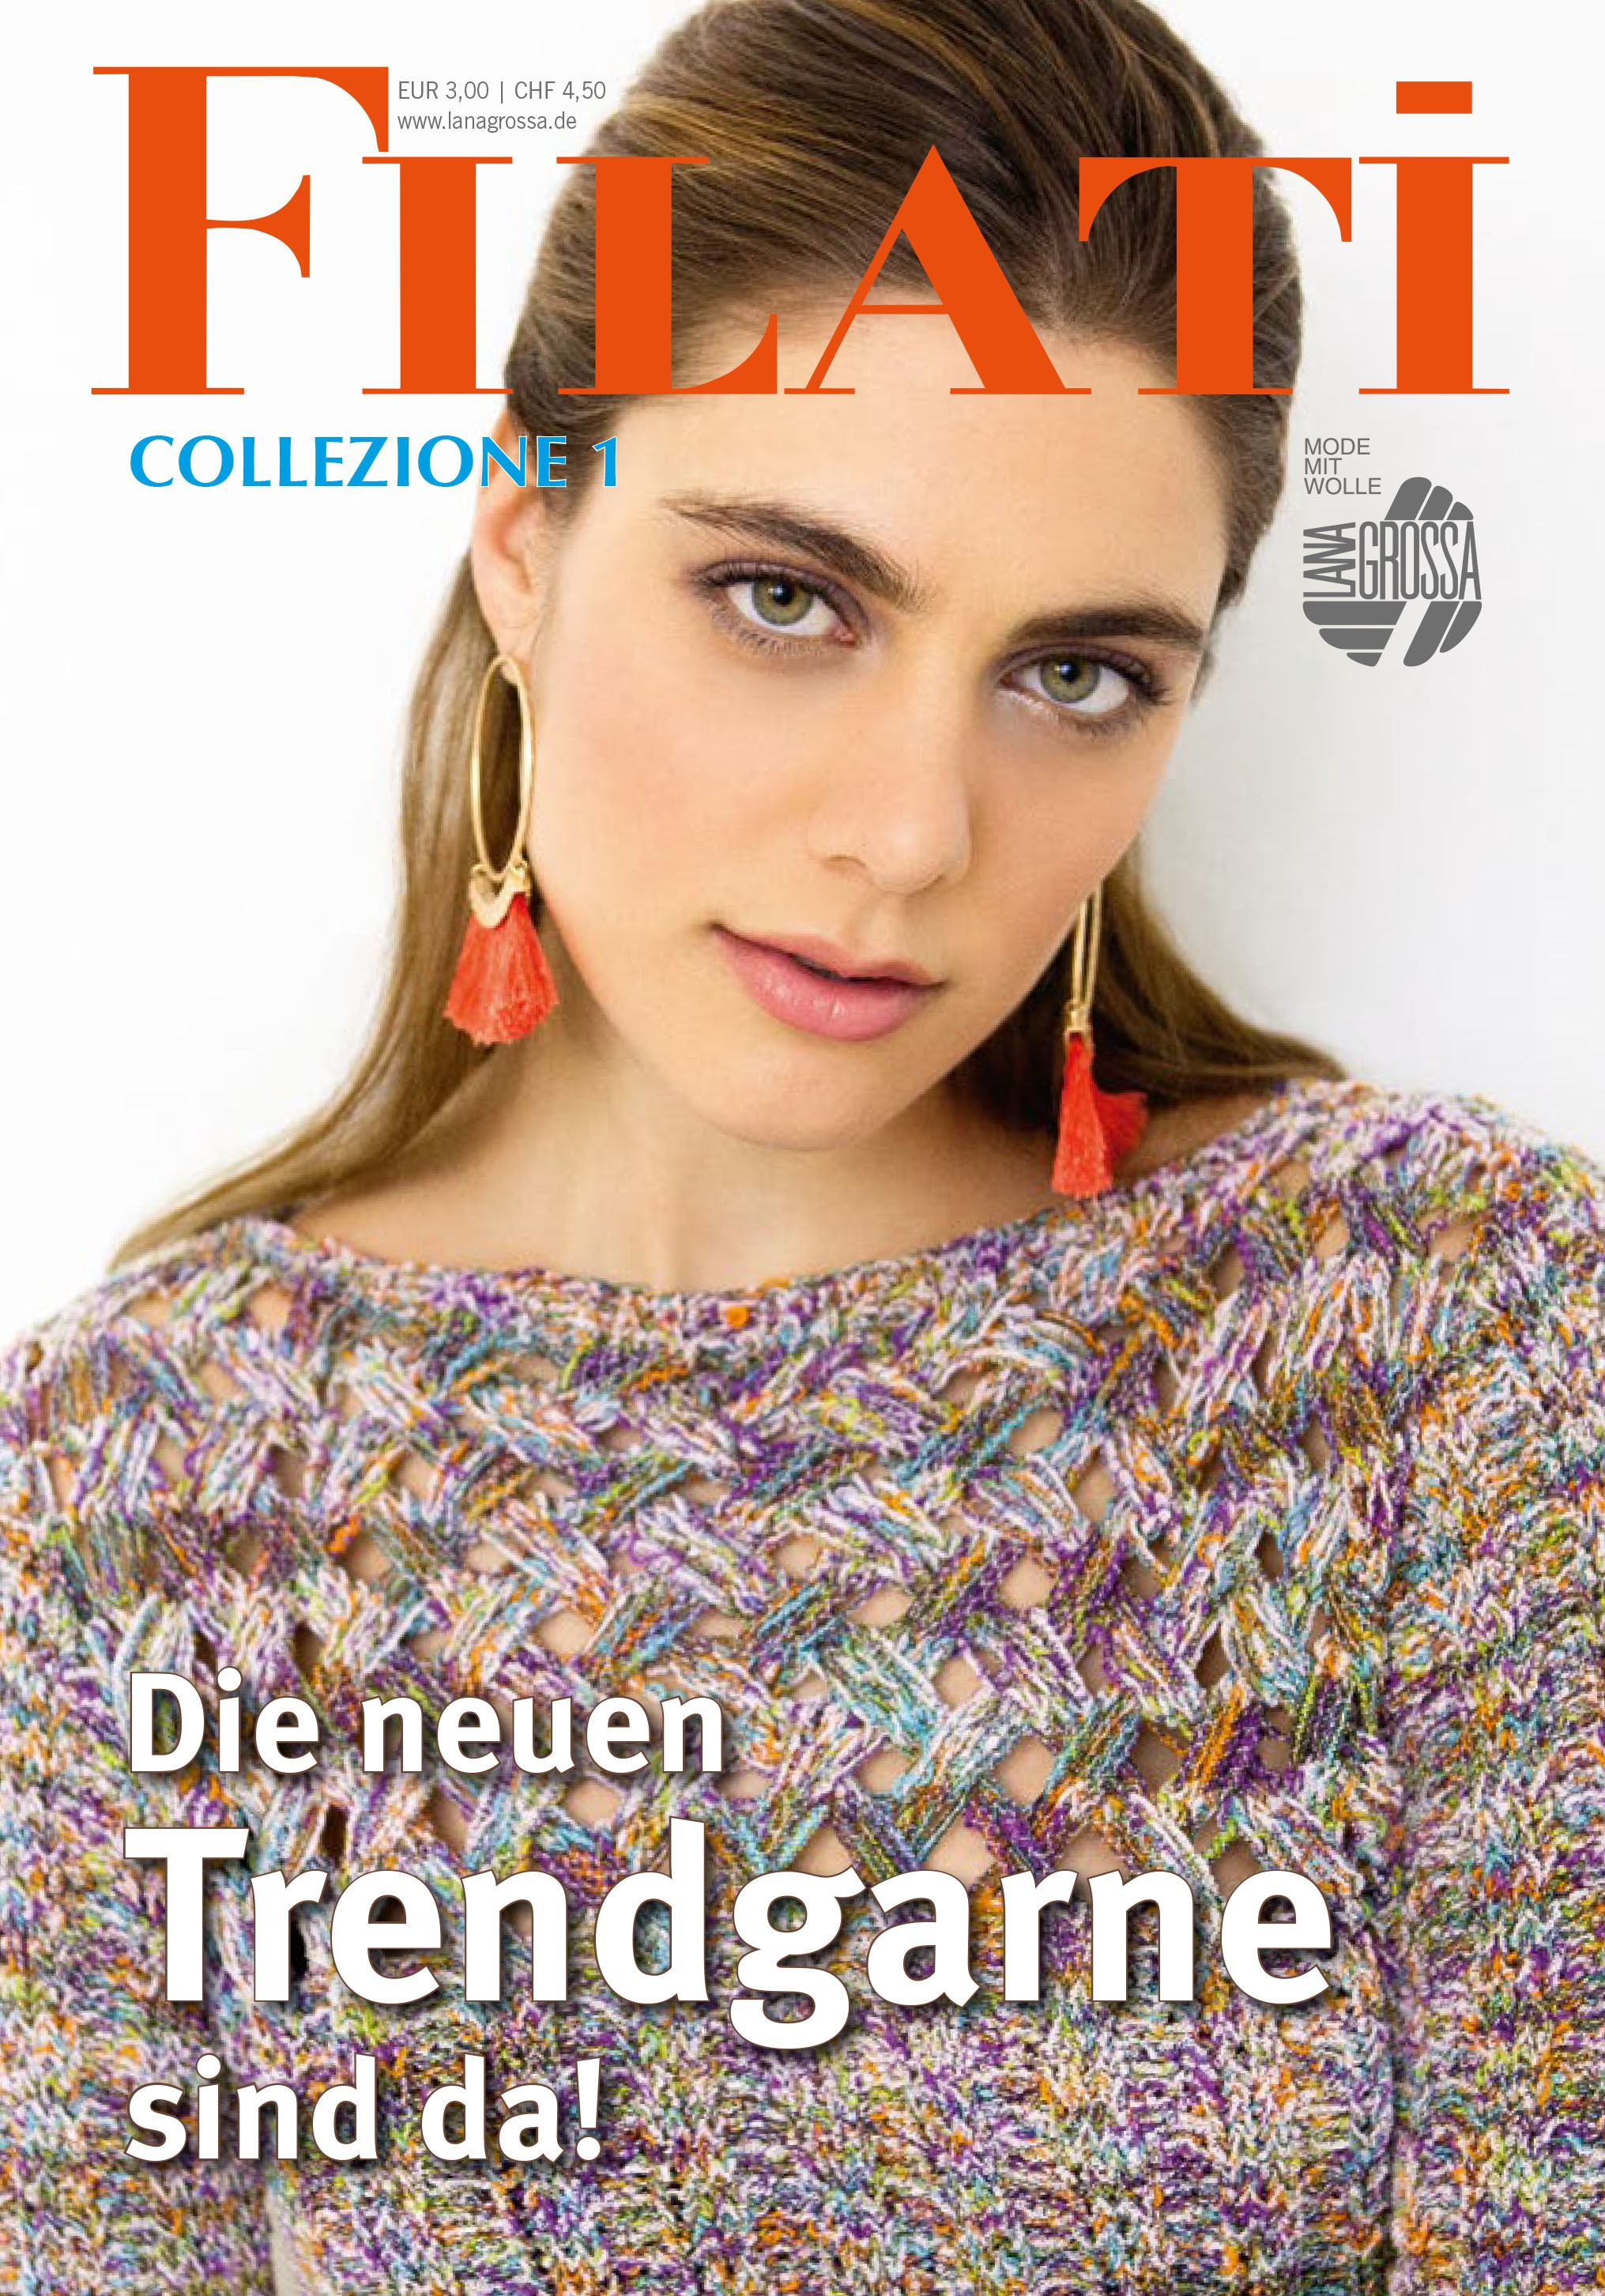 Lana Grossa FILATI COLLEZIONE No. 1 - Журнал на немецком,  инструкции на русском языке